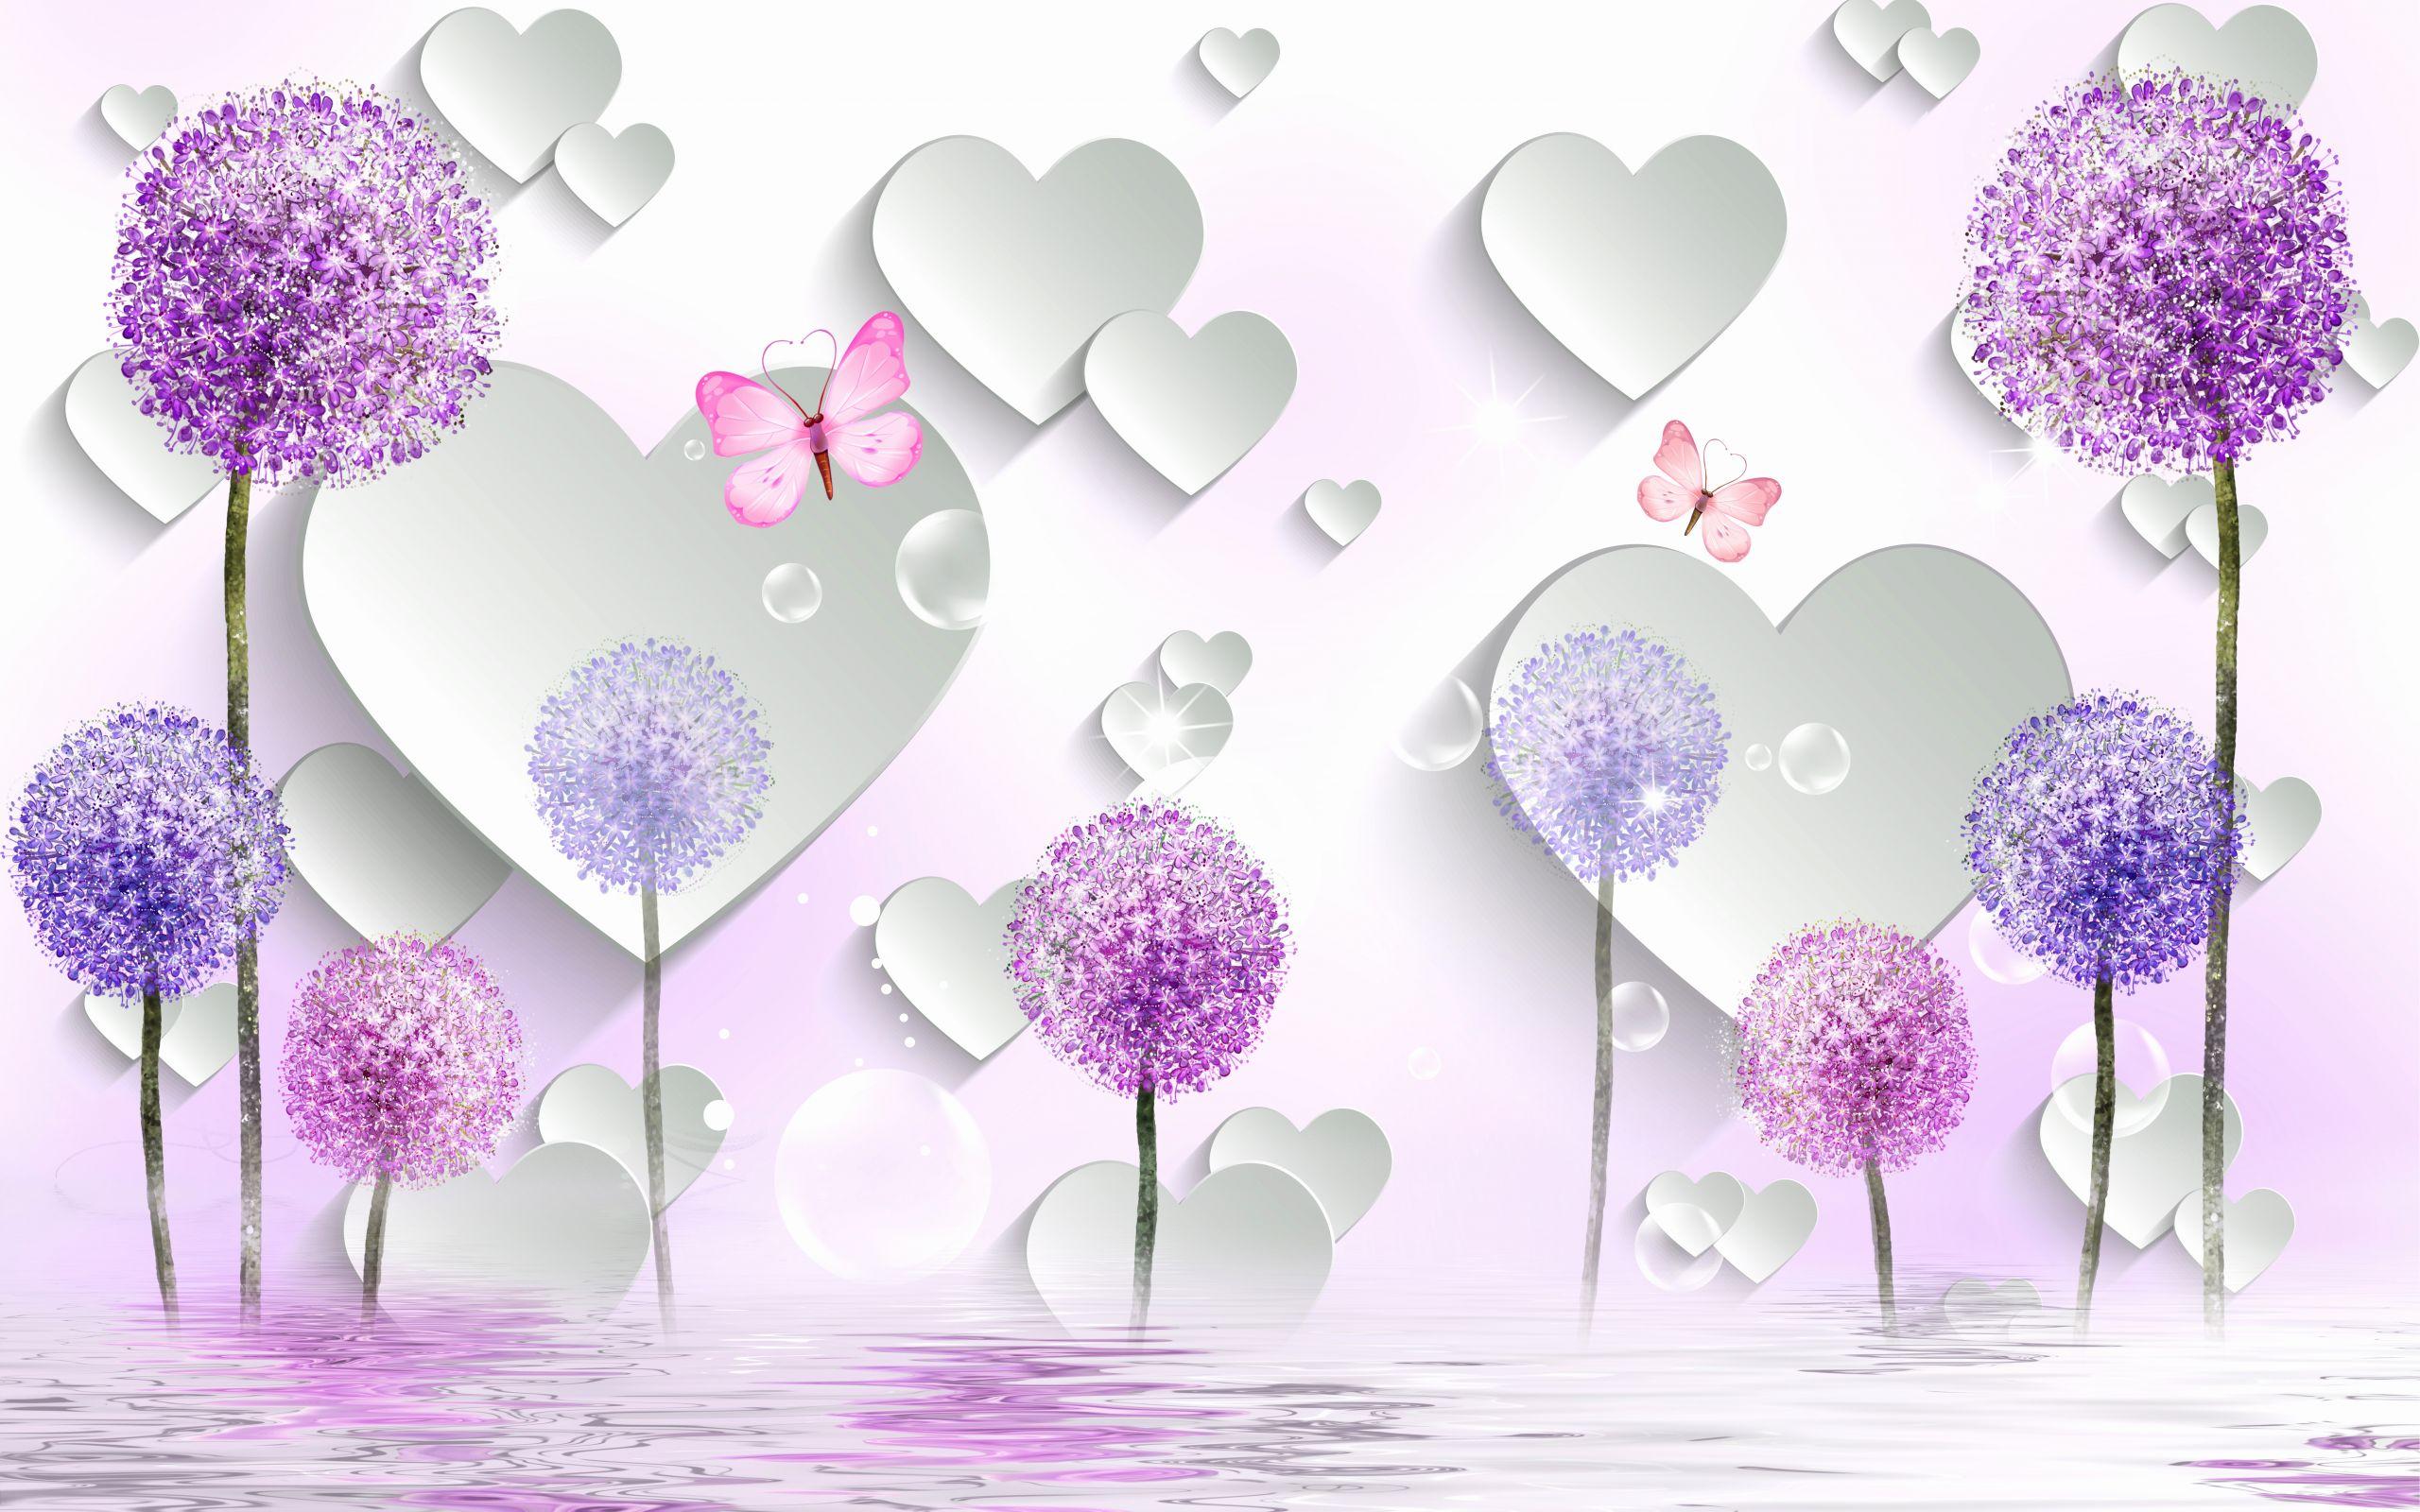 Purple Heart Certificate Template Beautiful Dandelion Background S Dandelion Background Vectors